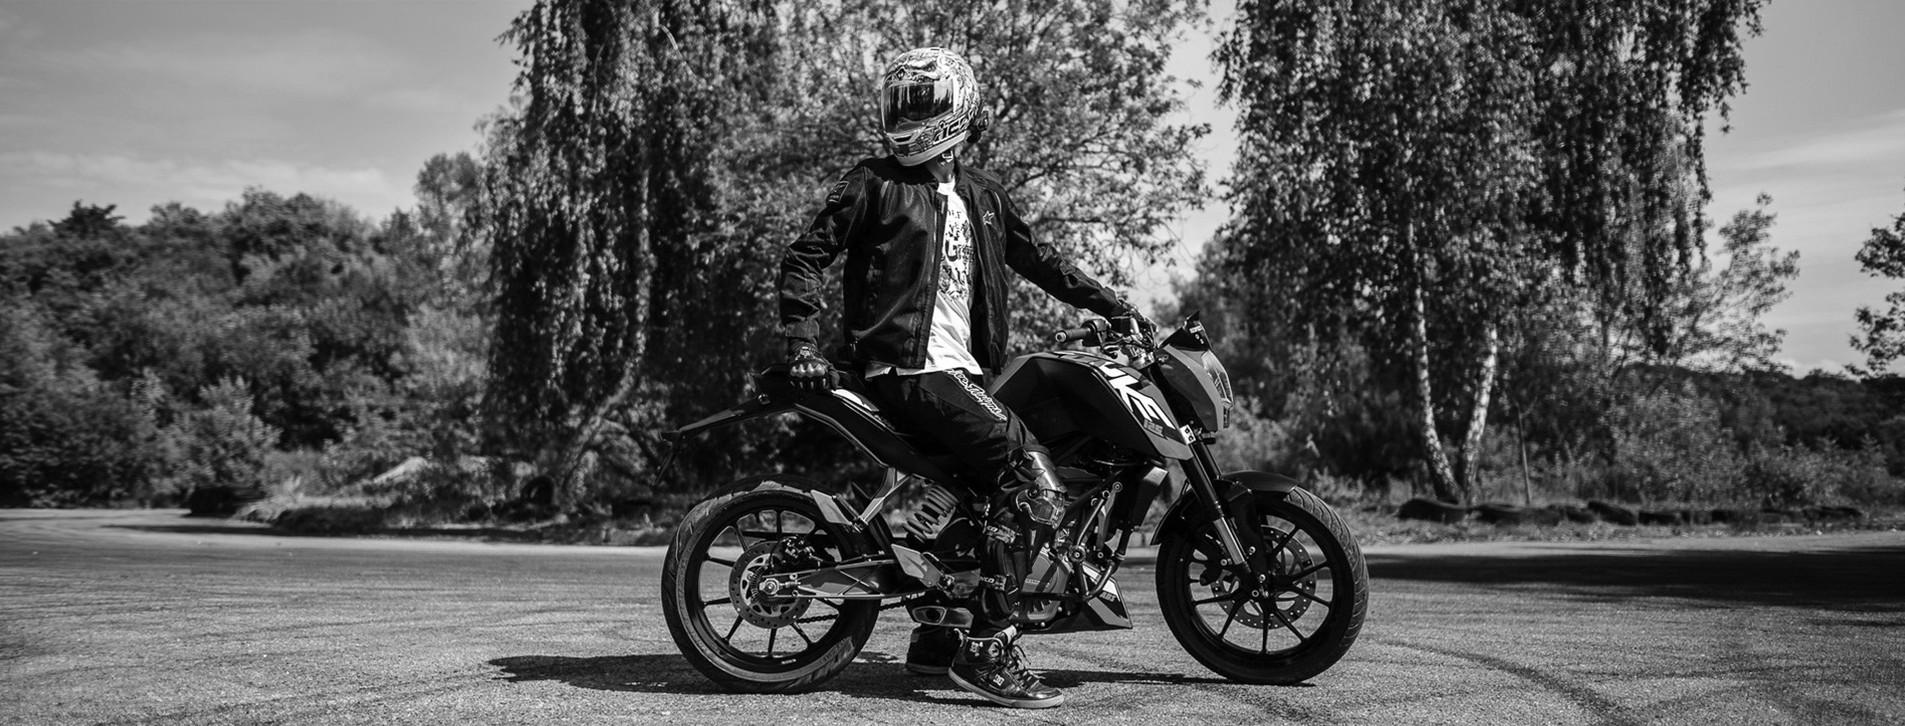 Фото 1 - Майстер-клас їзди на мотоциклі